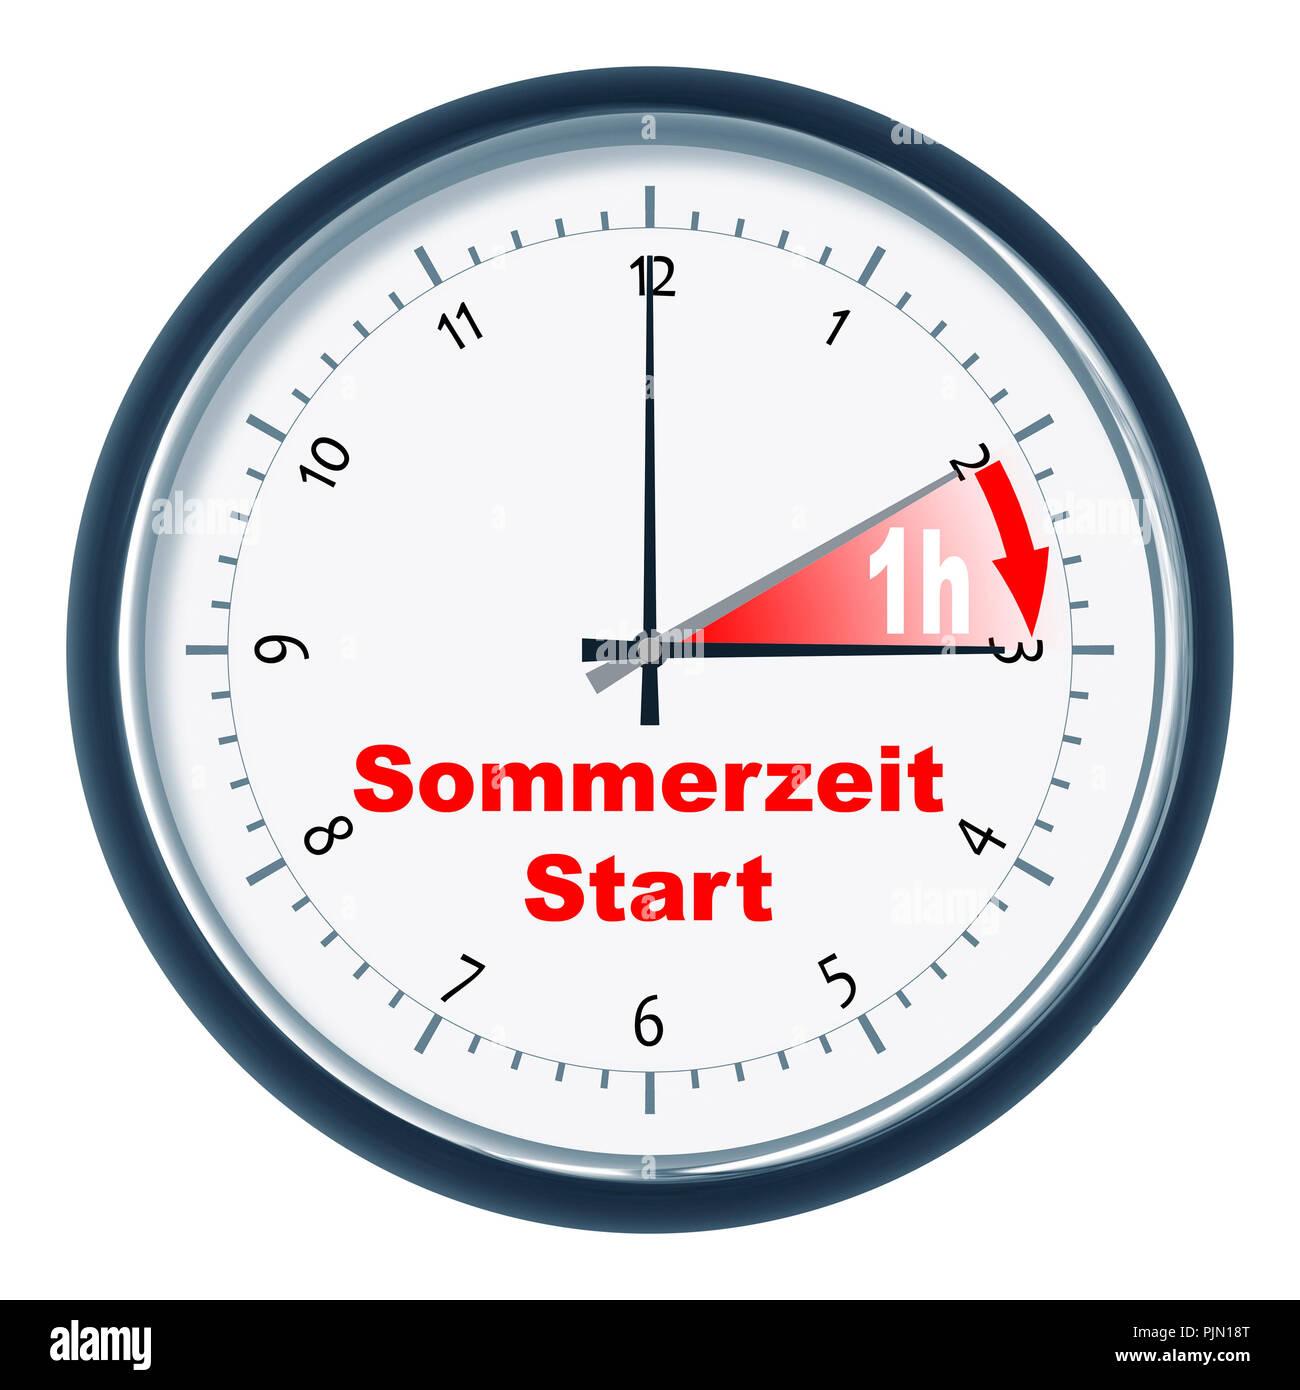 An image of a nice clock 'Sommerzeit Start' - Stock Image